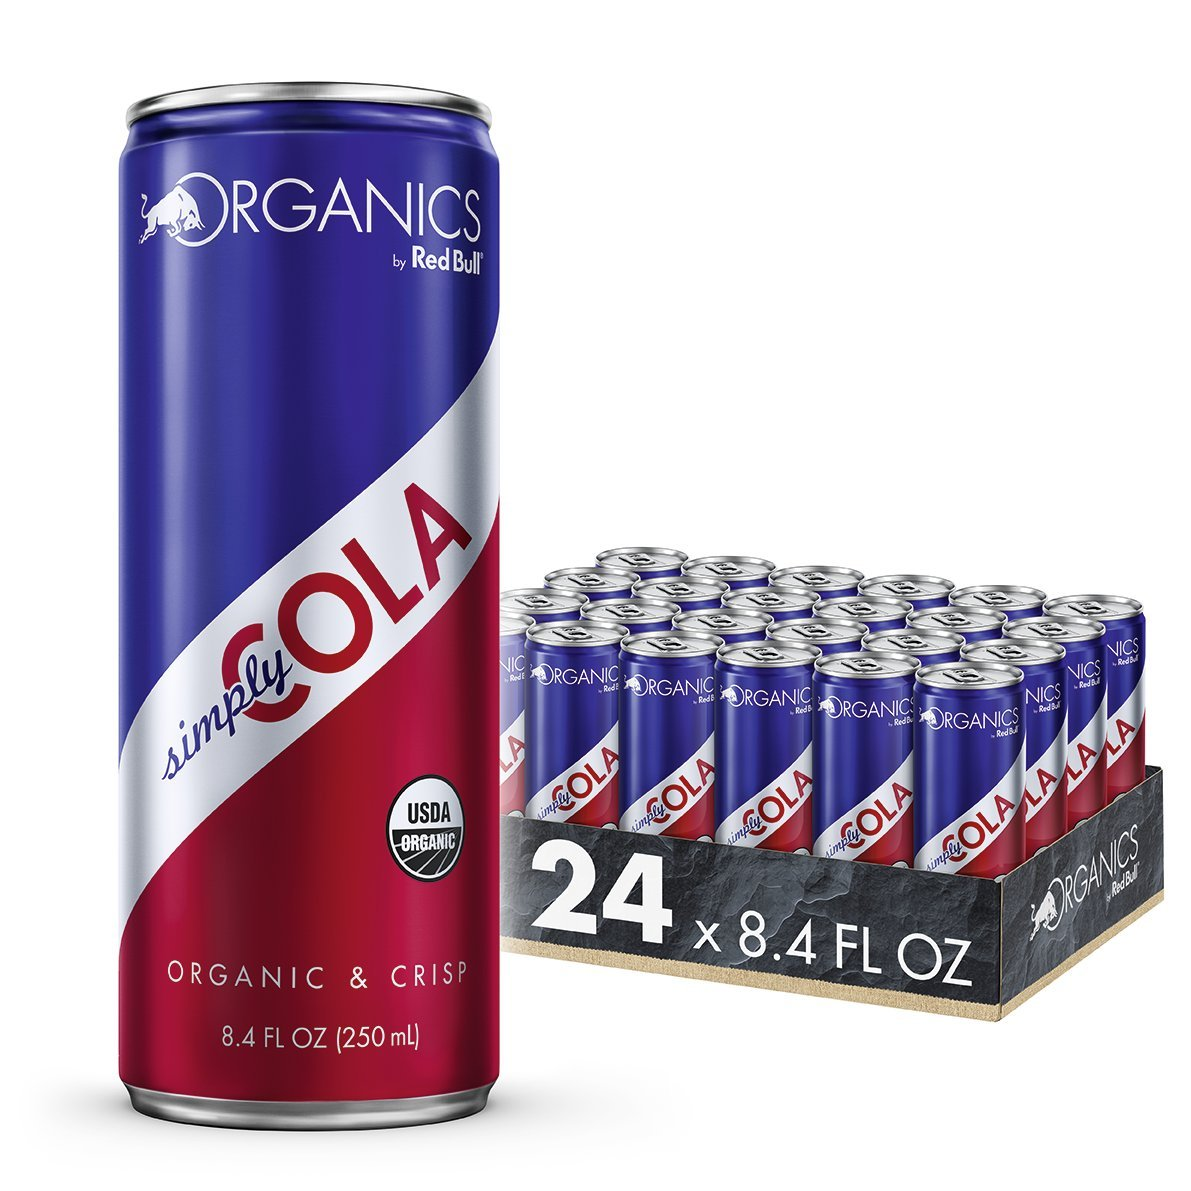 organics by red bull ginger ale 24 pack of 8. Black Bedroom Furniture Sets. Home Design Ideas